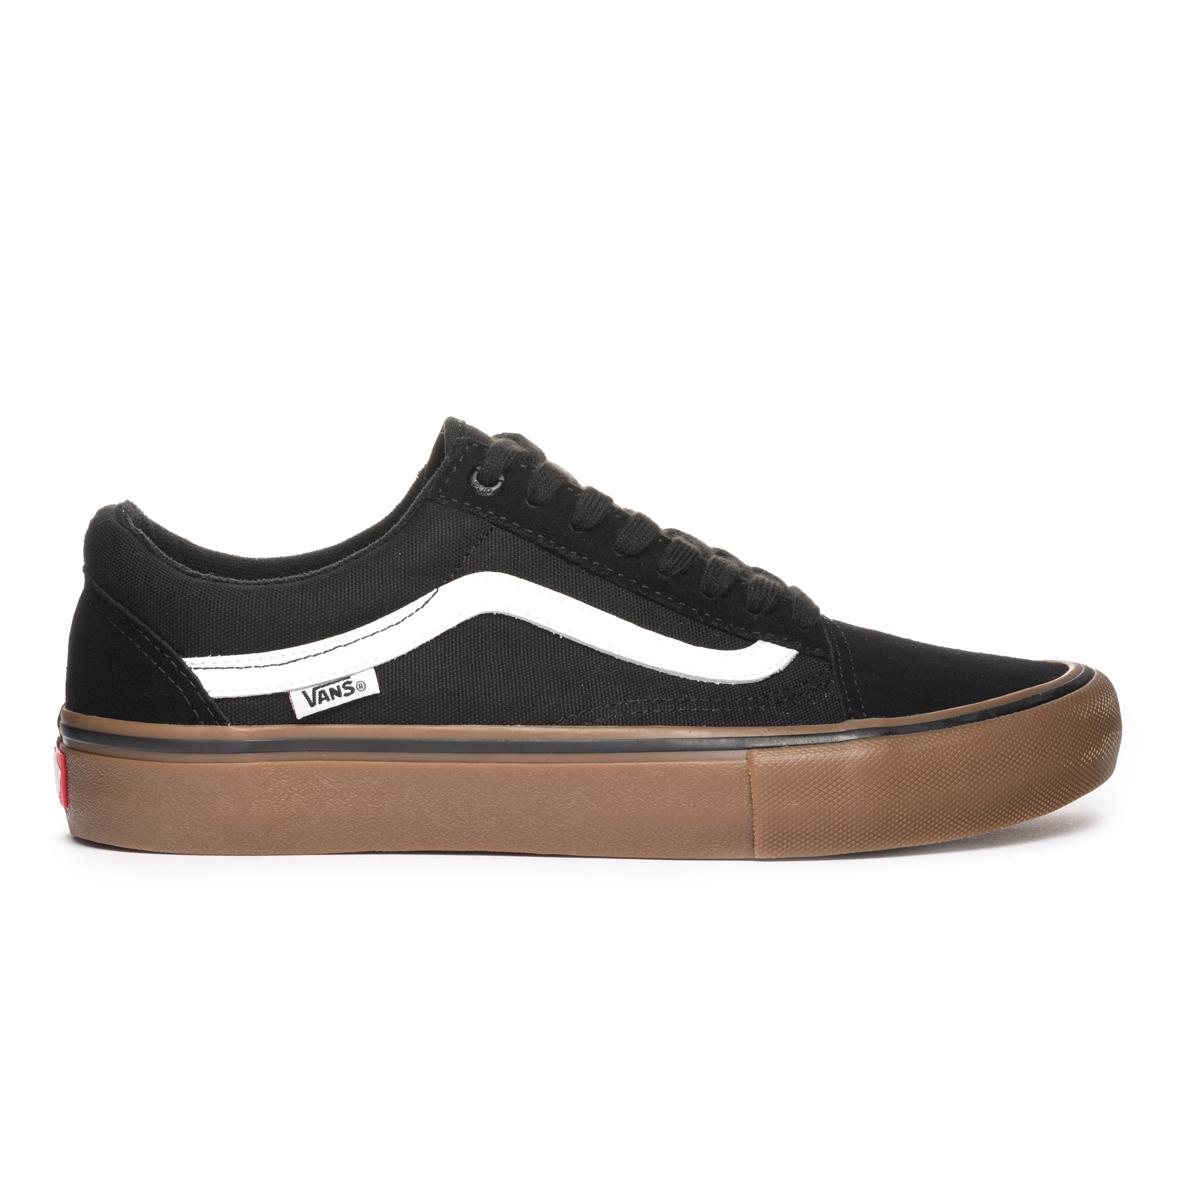 1a76850181d1fb ... Buty Vans Old Skool PRO Black   White   Medium Gum · Zdjęcie produktu